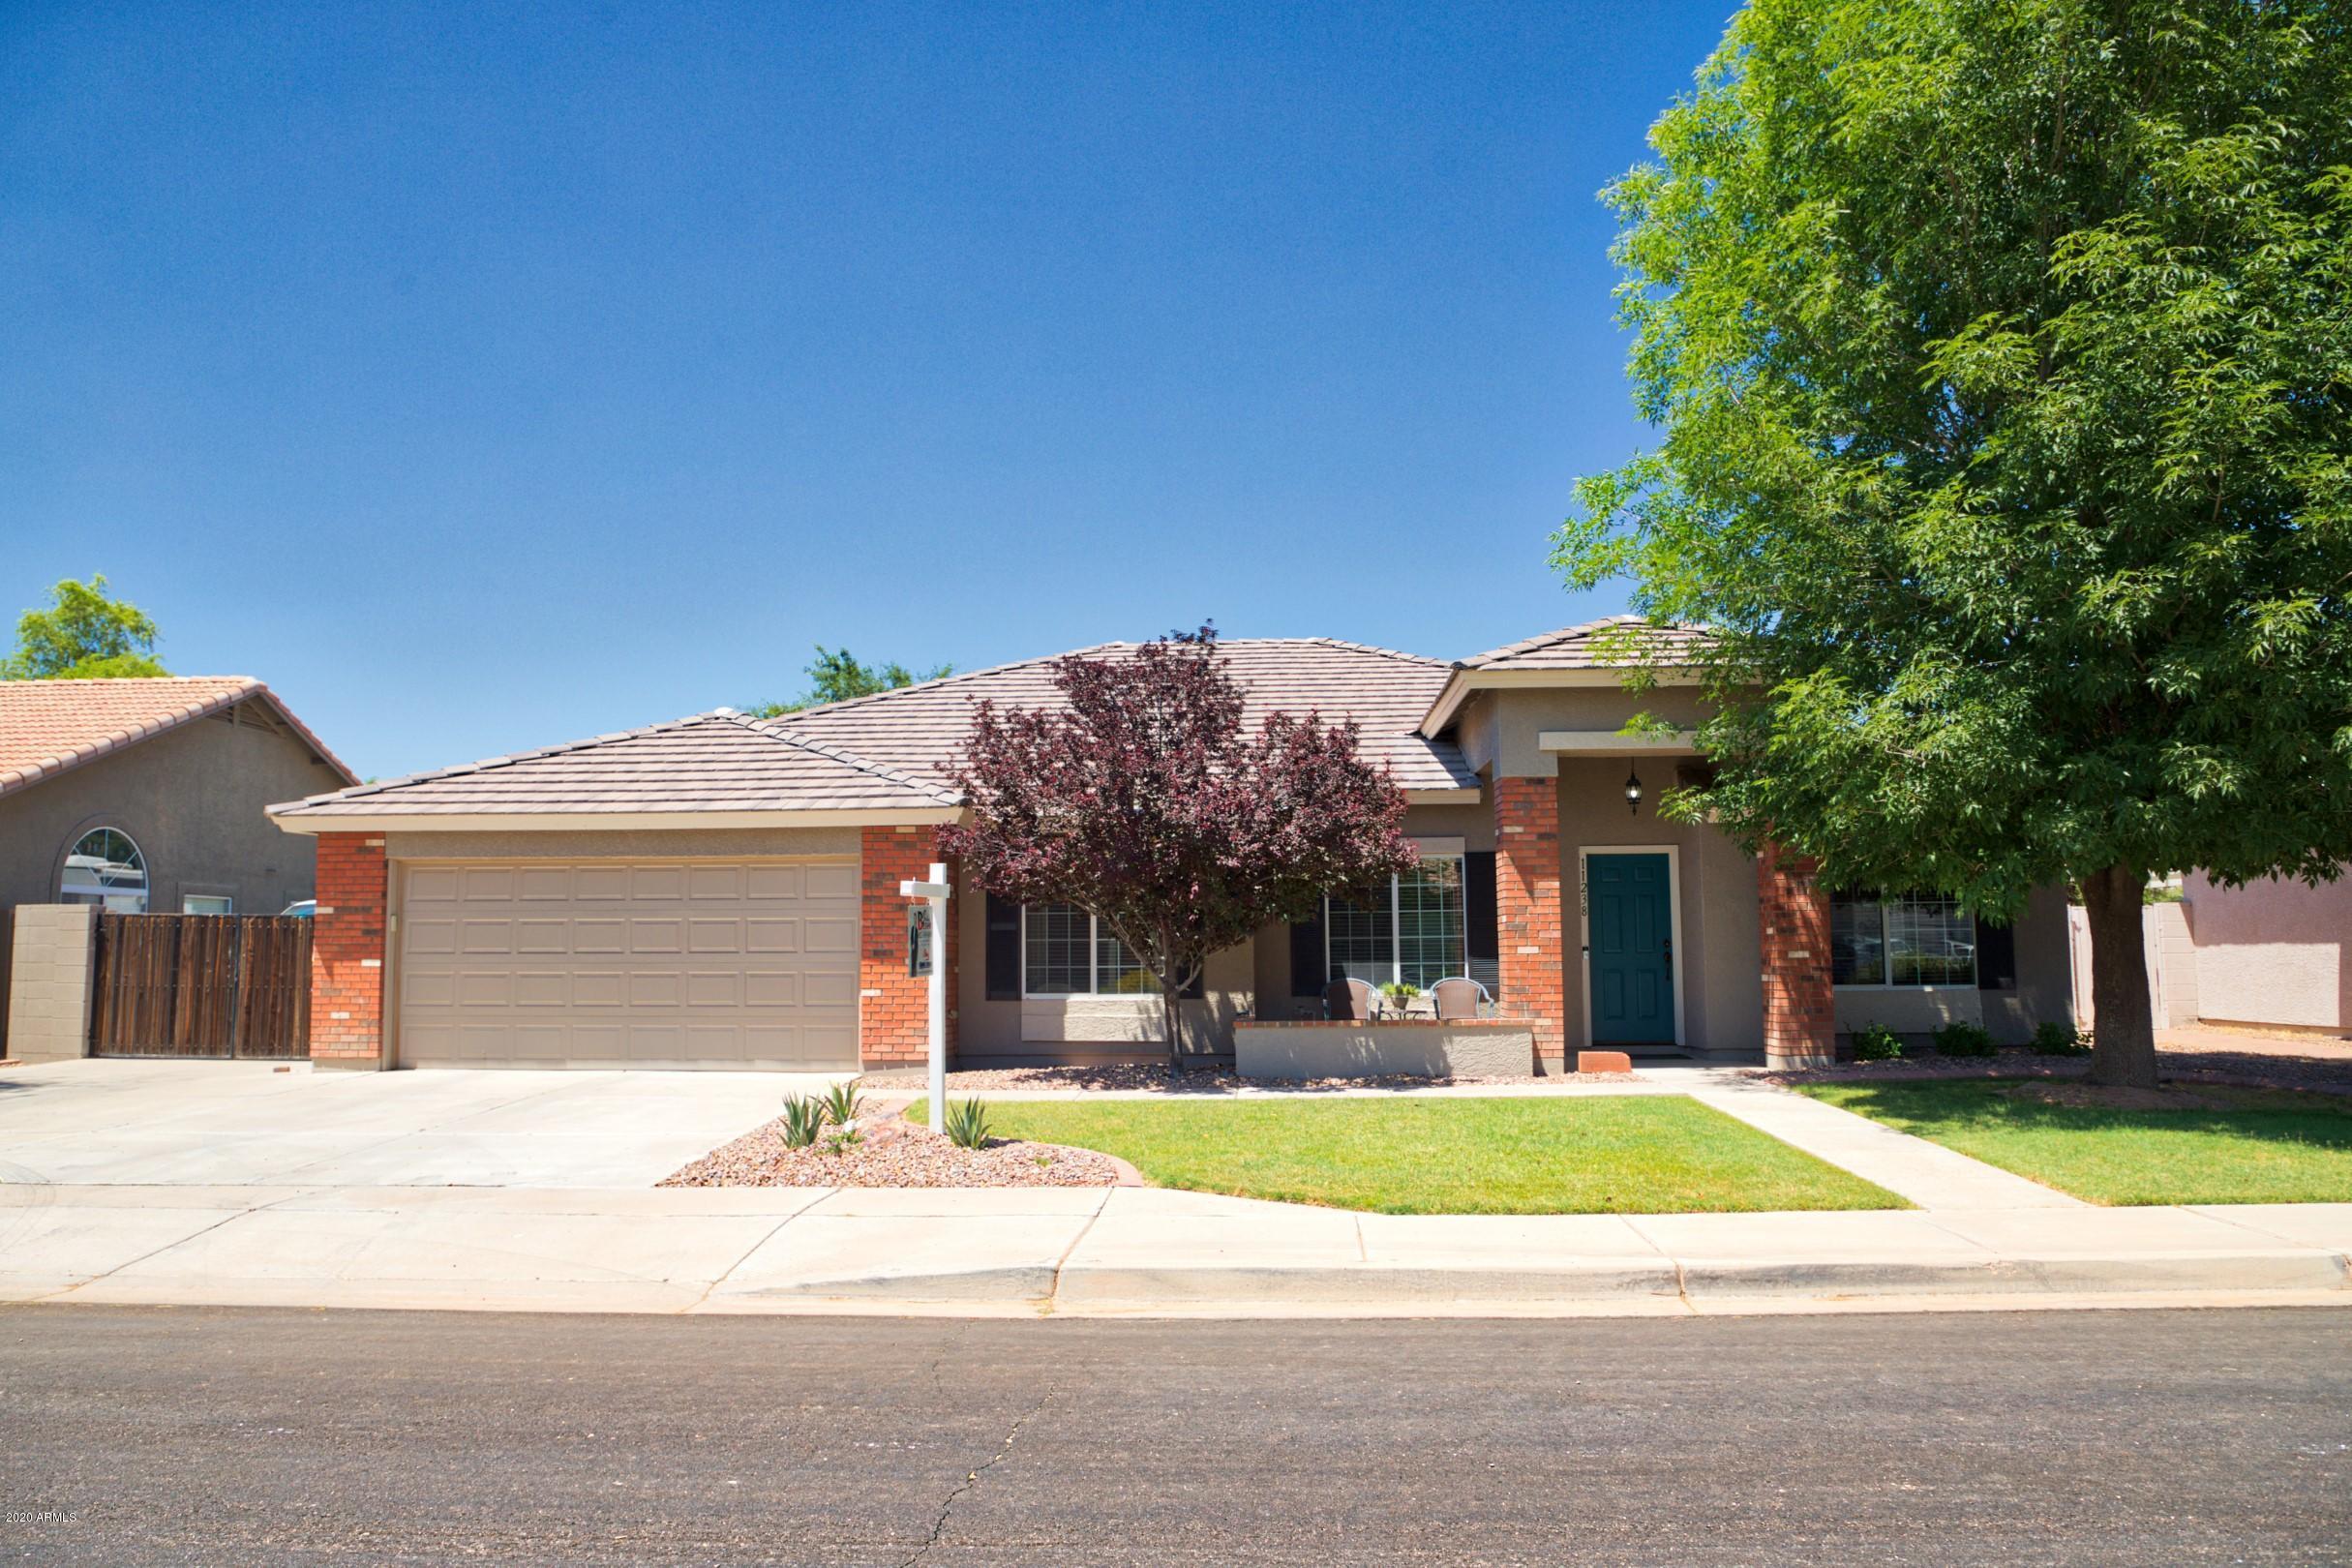 Photo of 11238 E RENFIELD Avenue, Mesa, AZ 85212